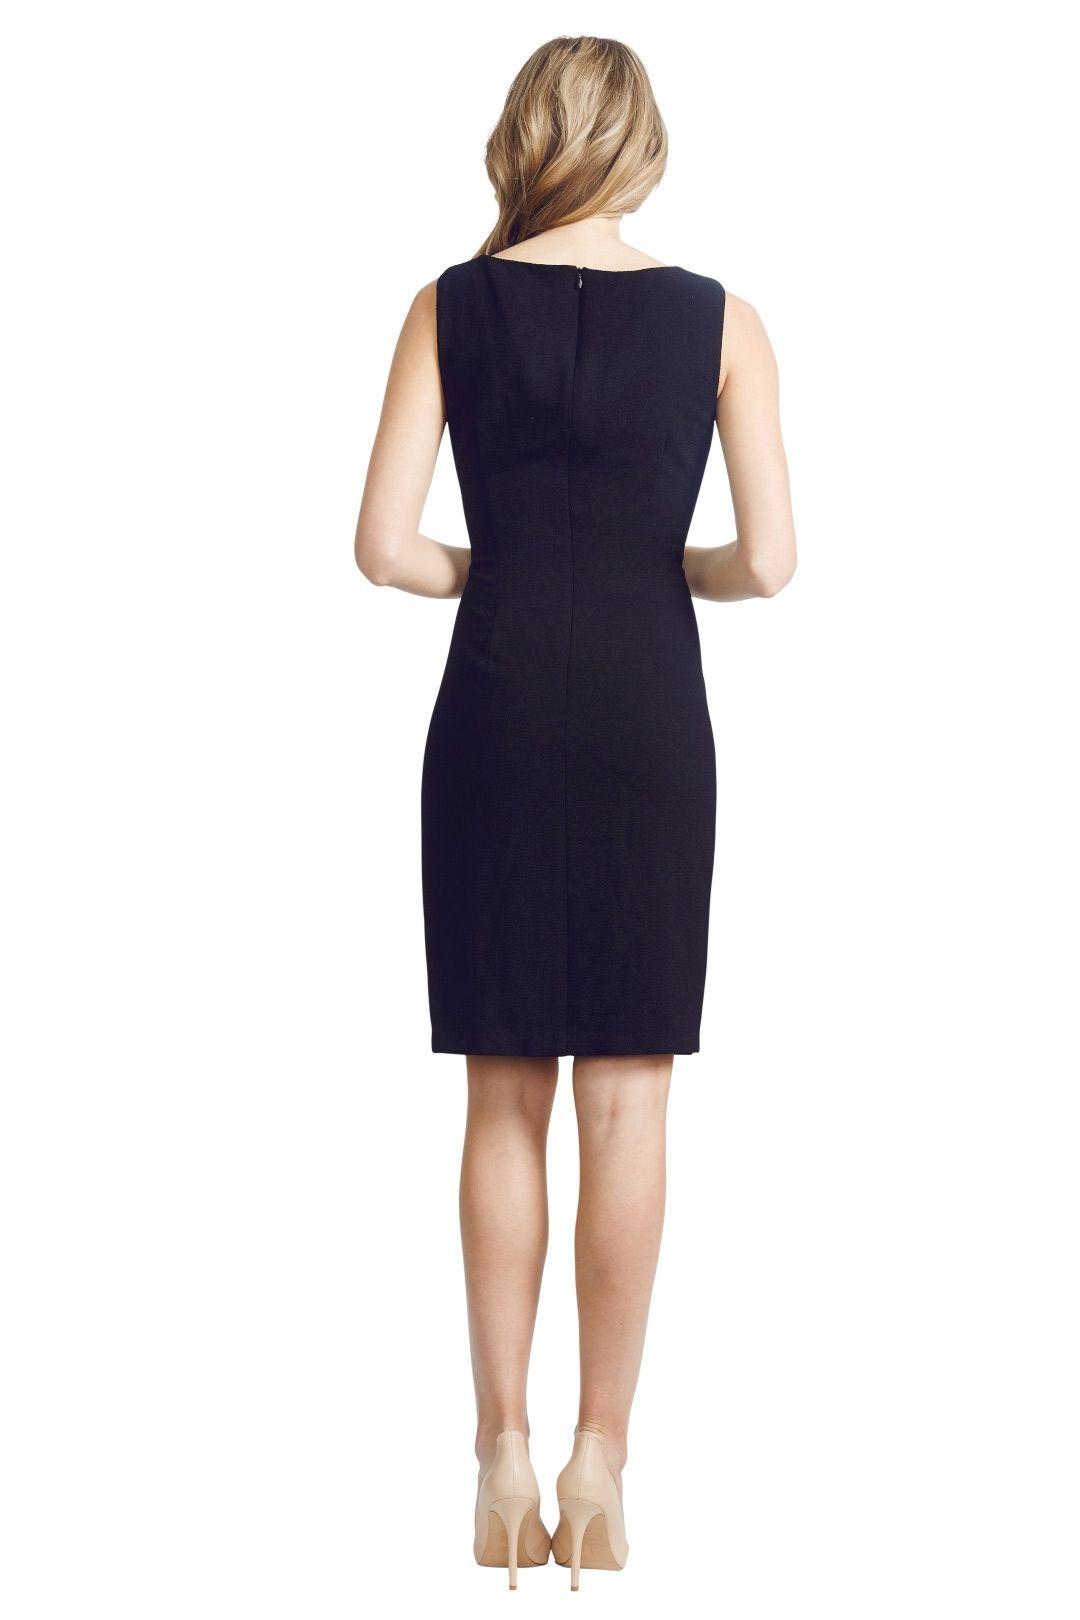 David  Meister  - Lace Panel Dress - Black - Back